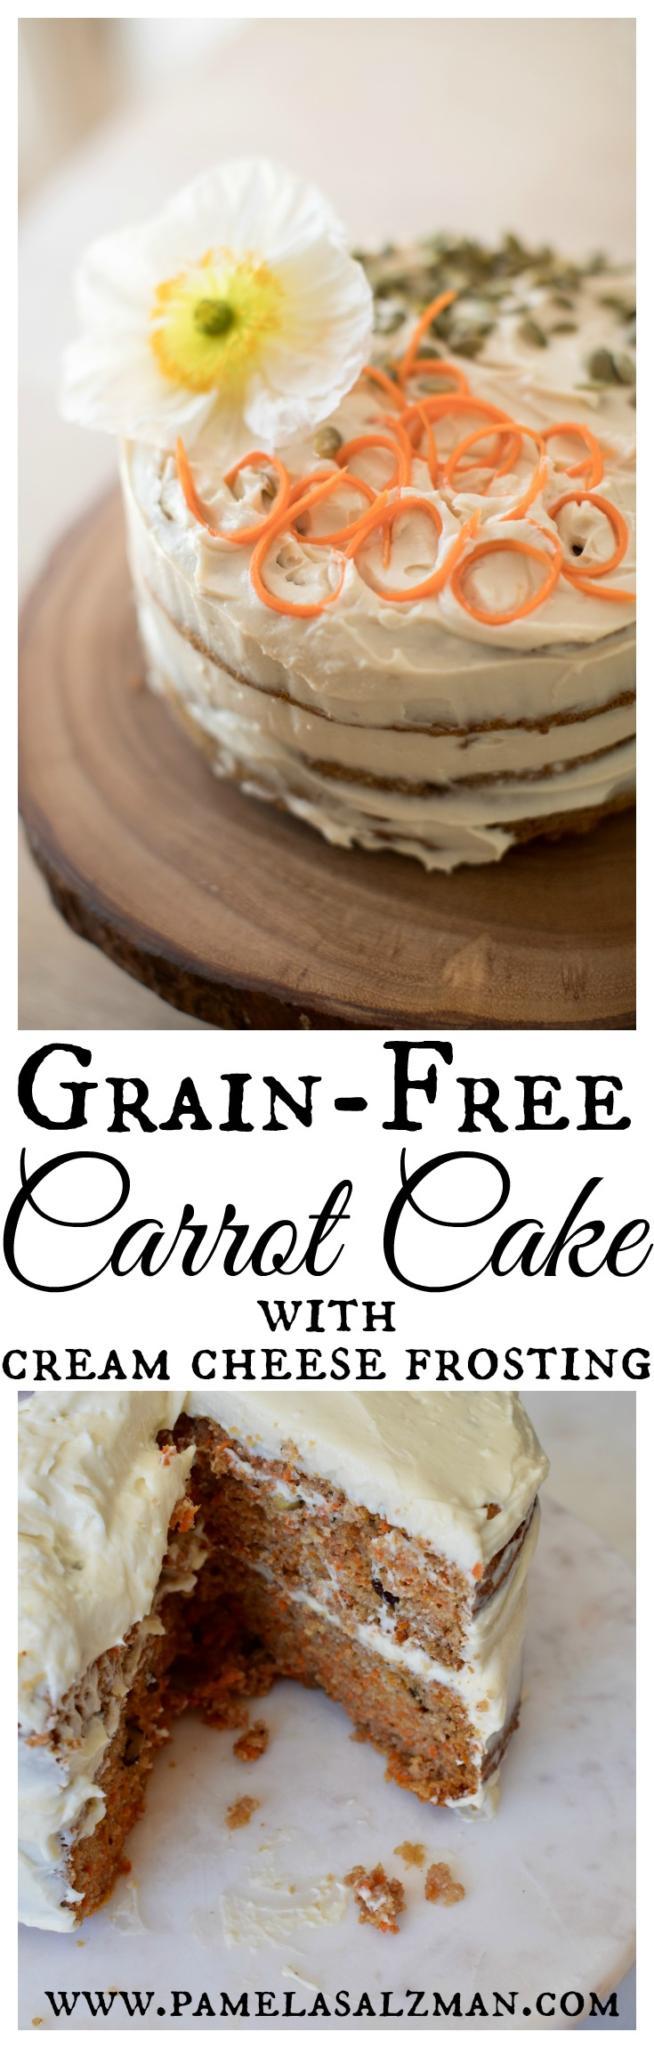 Grain-Free Carrot Cake with Cream Cheese Frosting   Pamela Salzman